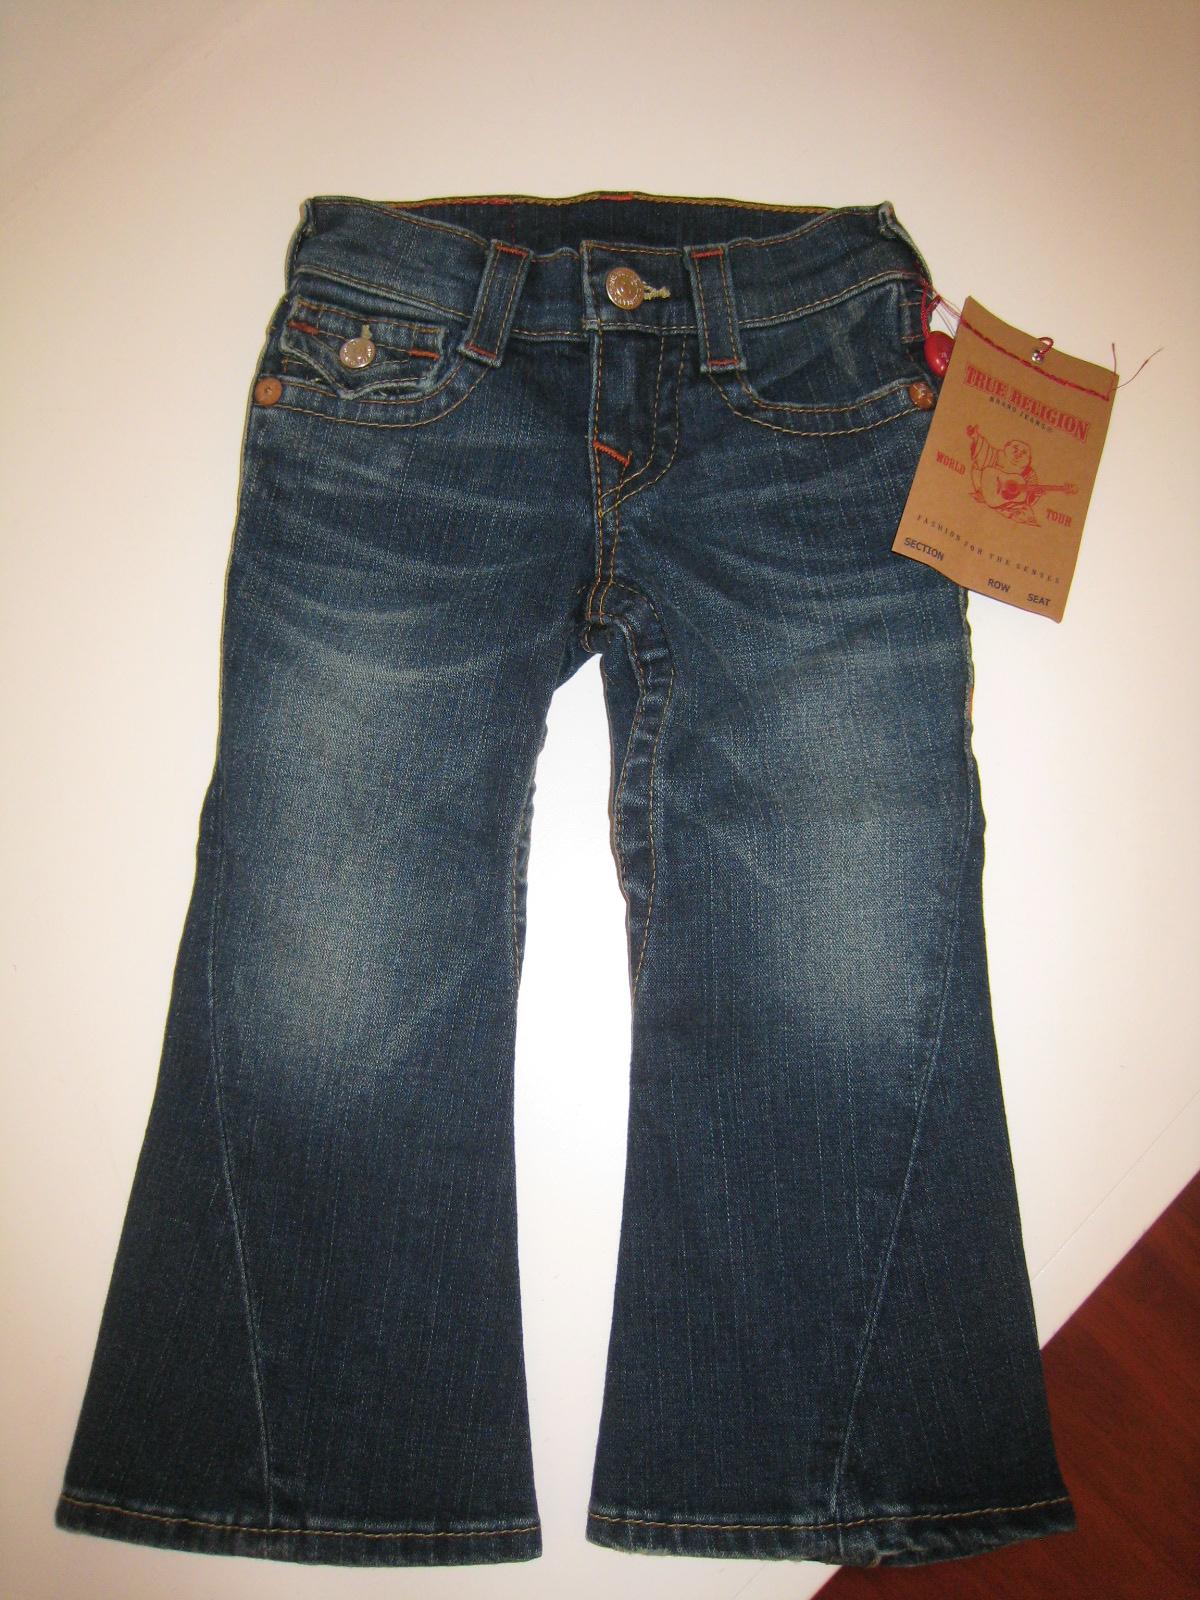 Elisa Wen: Sale On Boys And Girls True Religion Jeans!!!